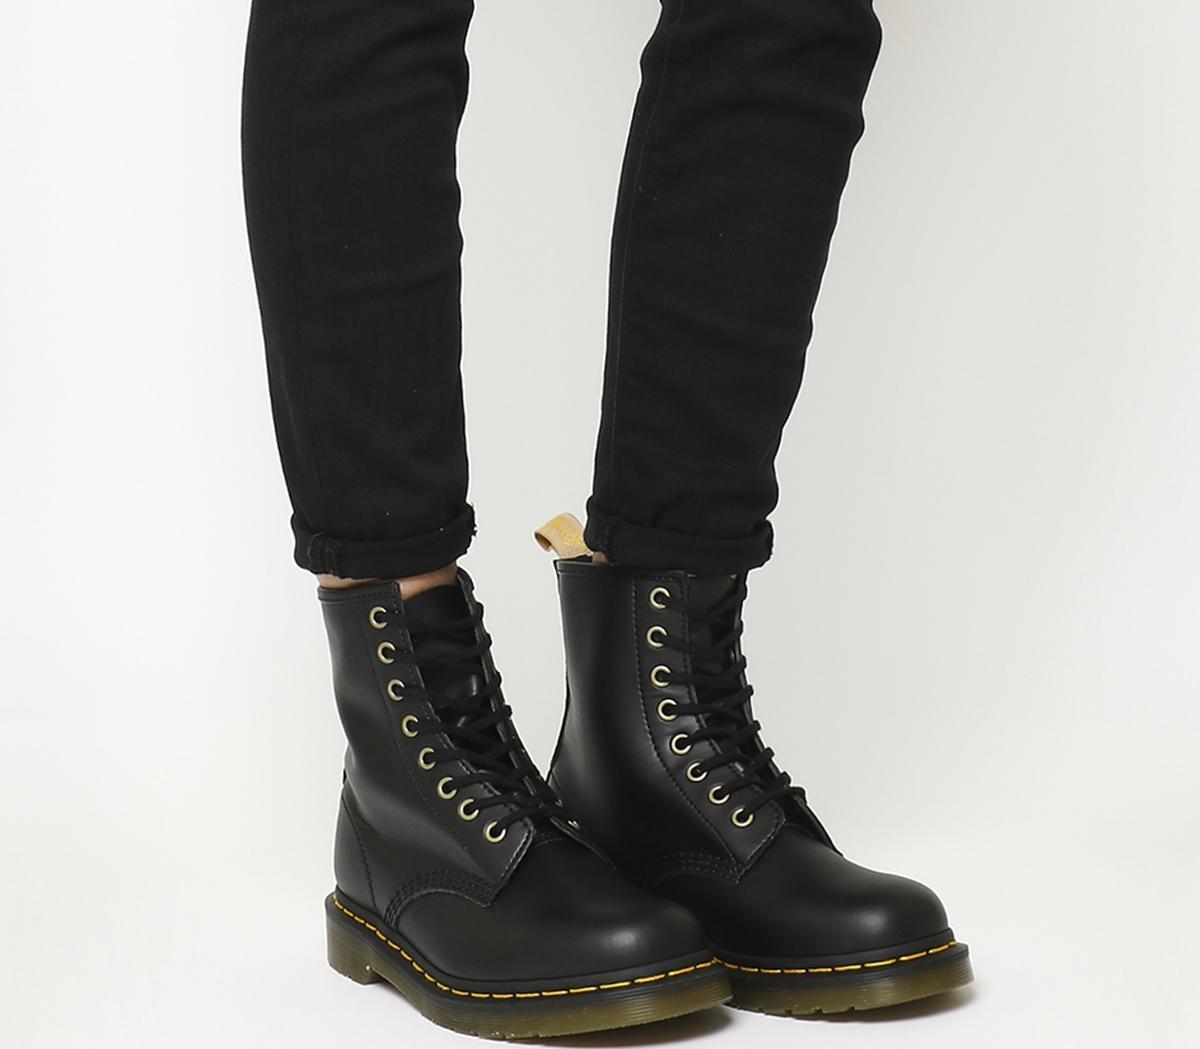 Vegan 1460 8 Eye Boots F